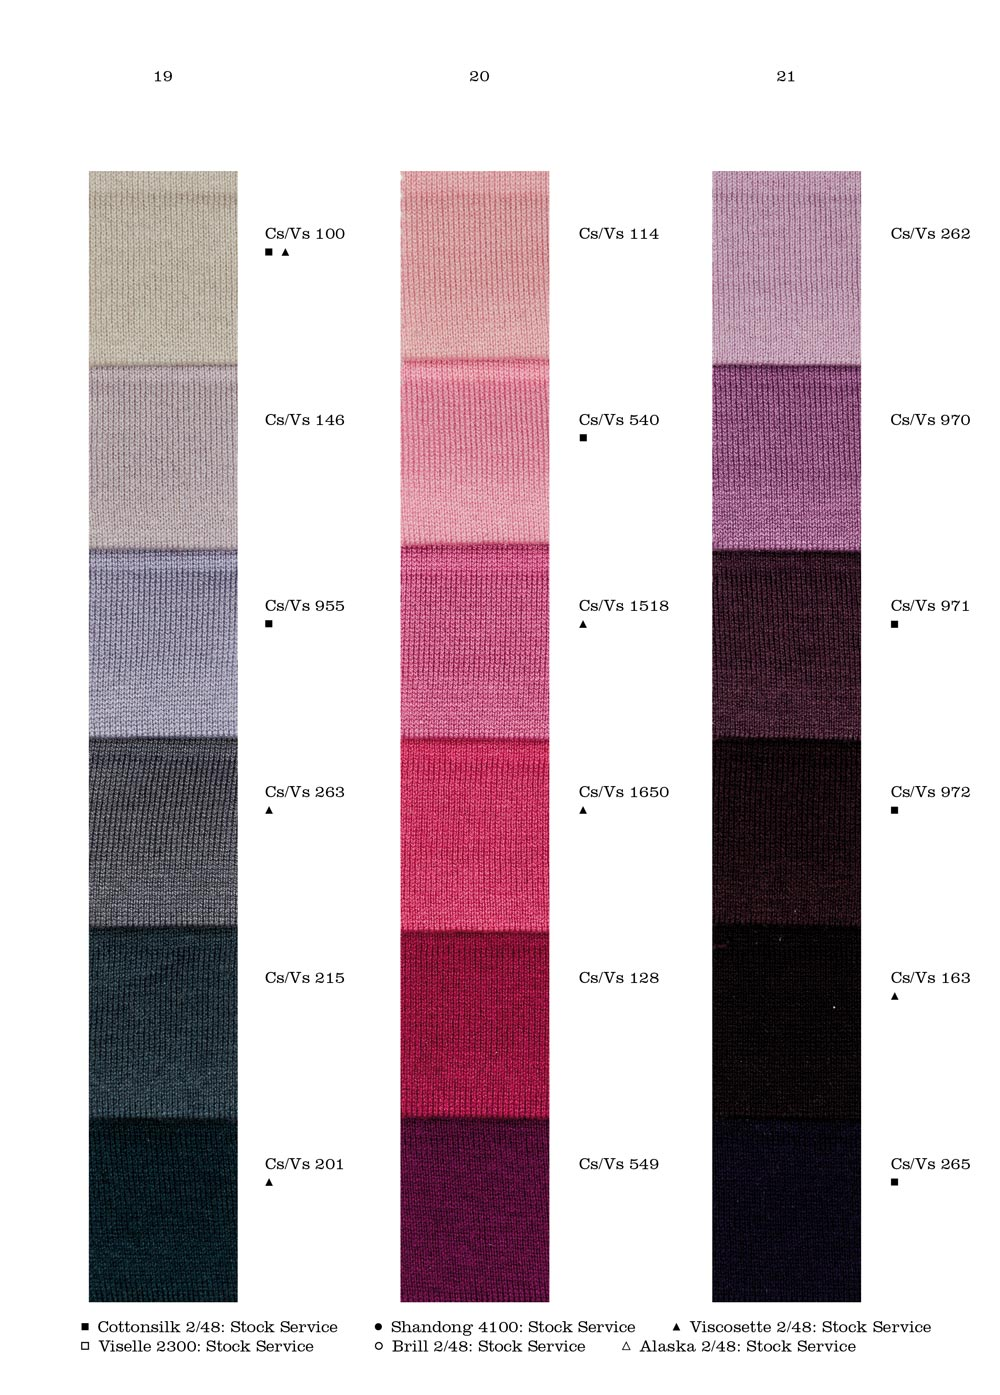 SeS_PE-22_Cottonsilk-Shandong-Viscosette-Viselle14